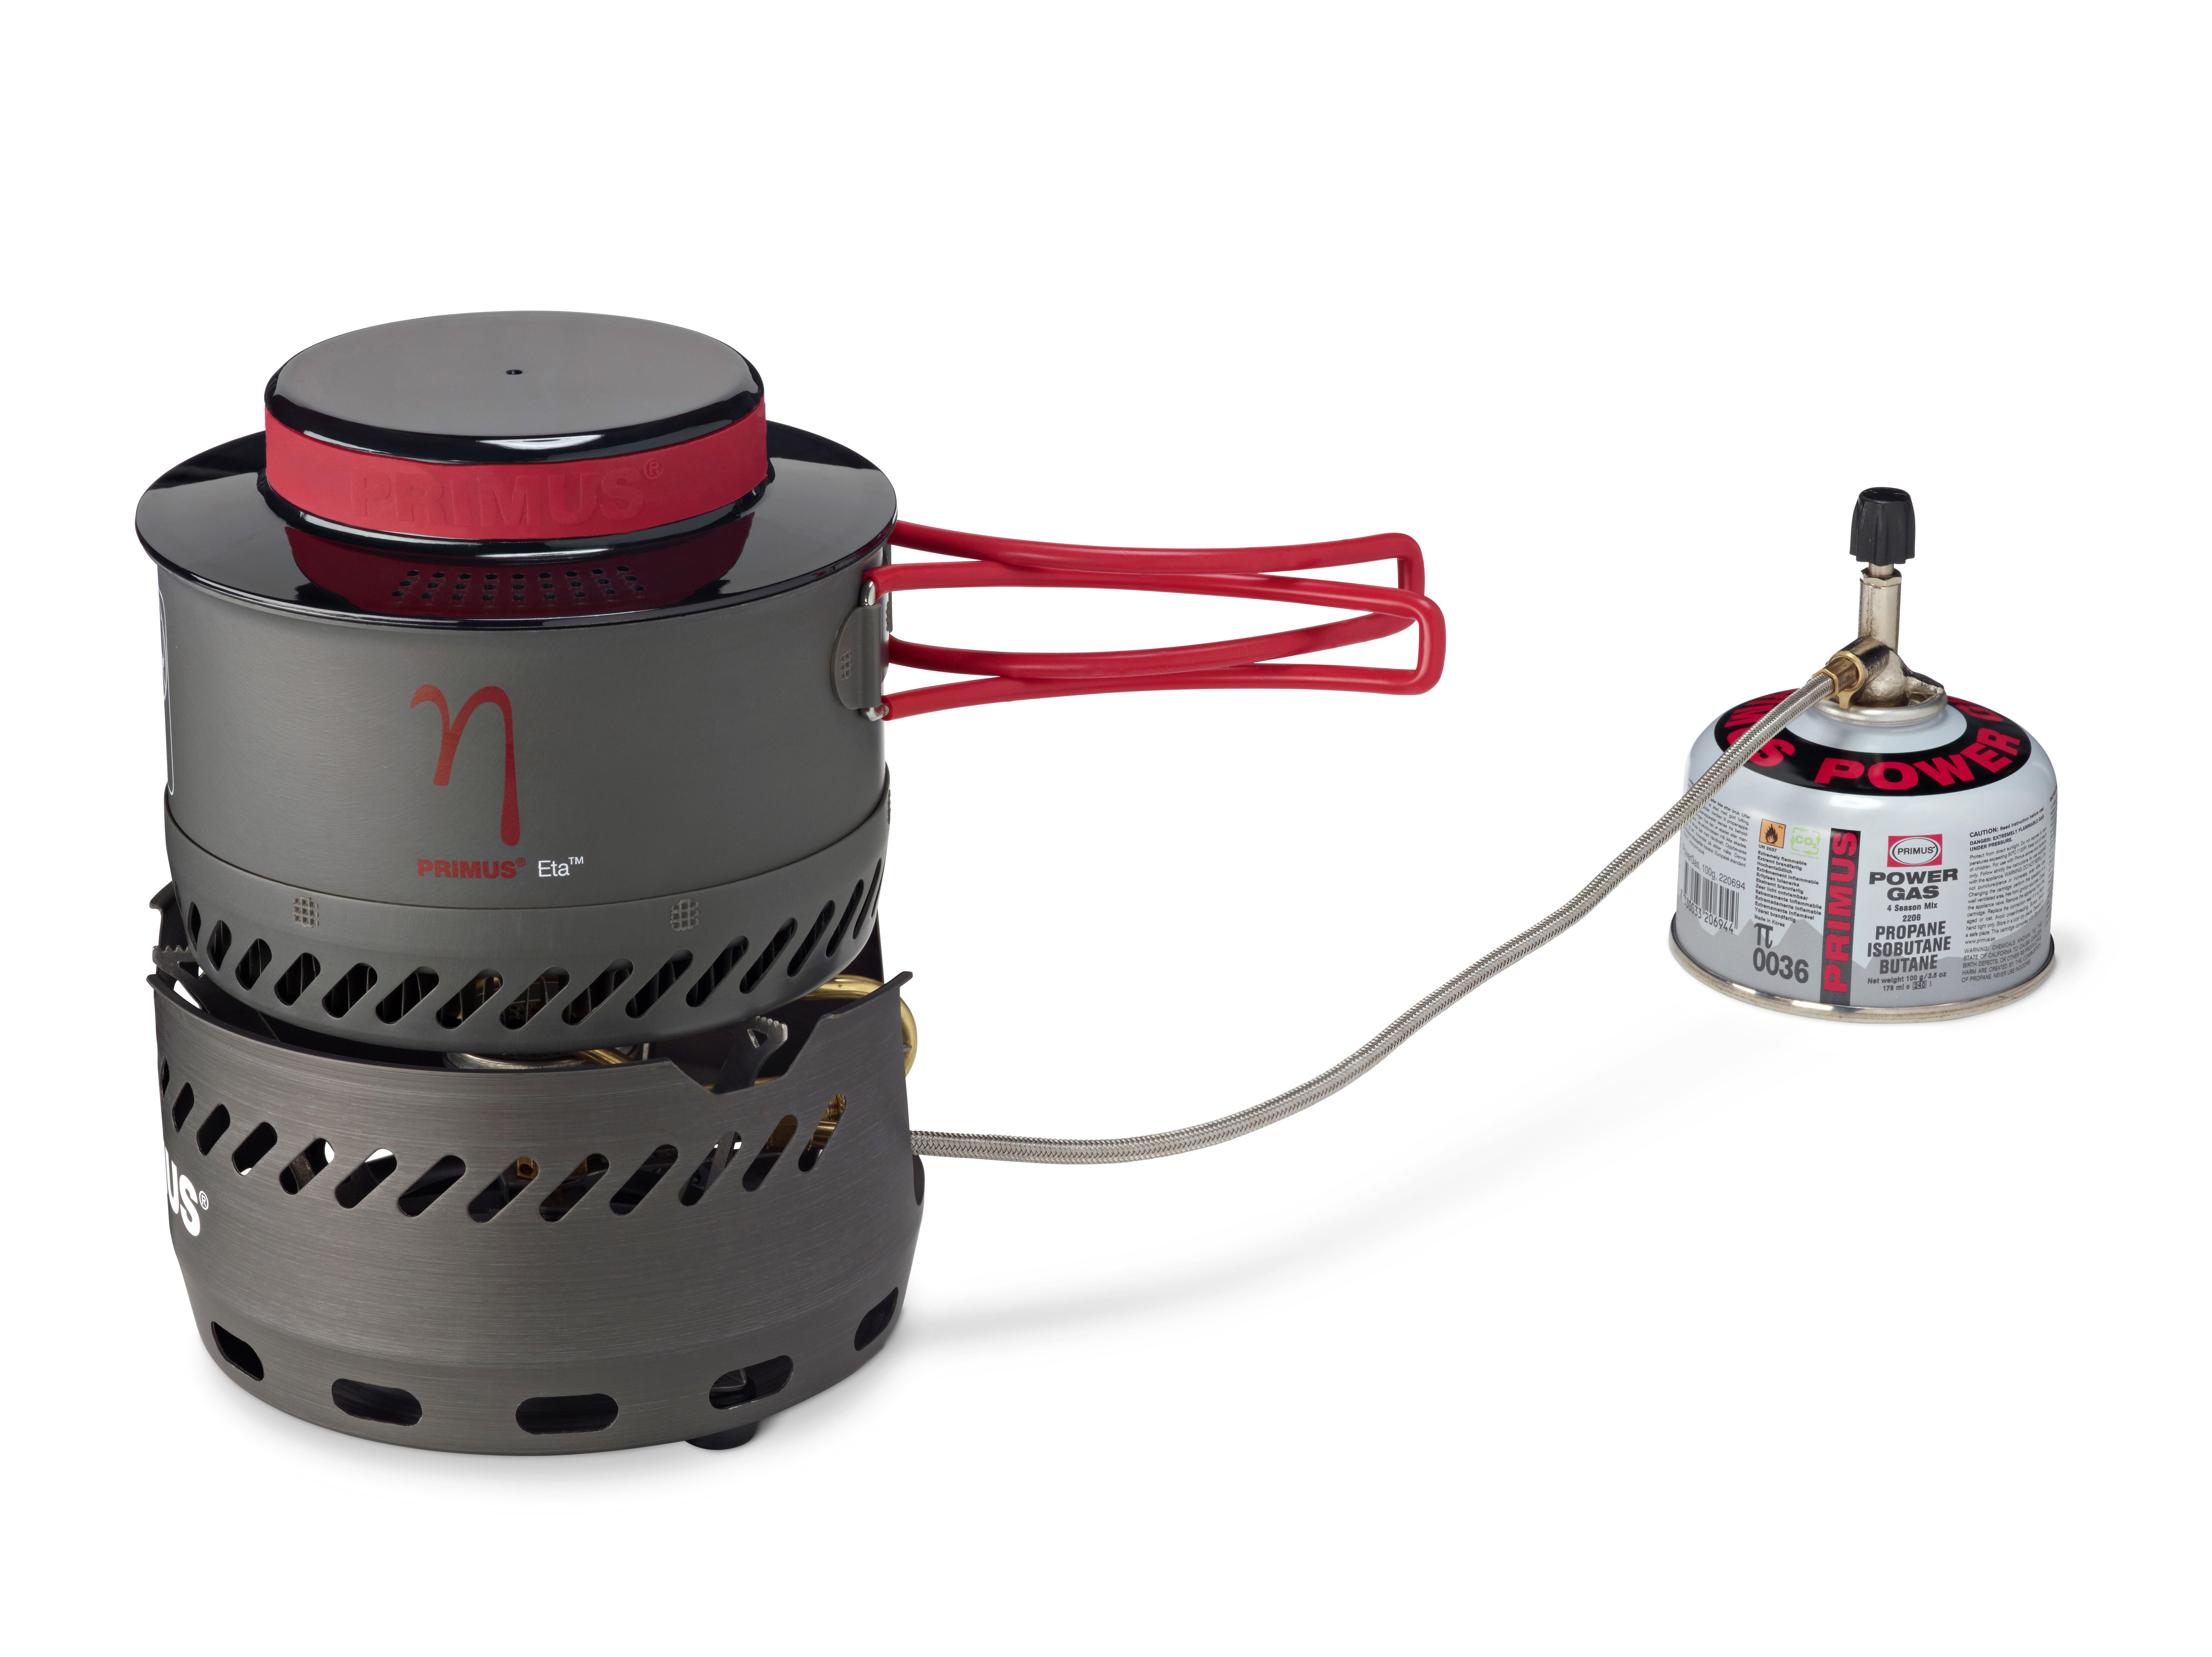 New Kit: Primus Eta Spider stove